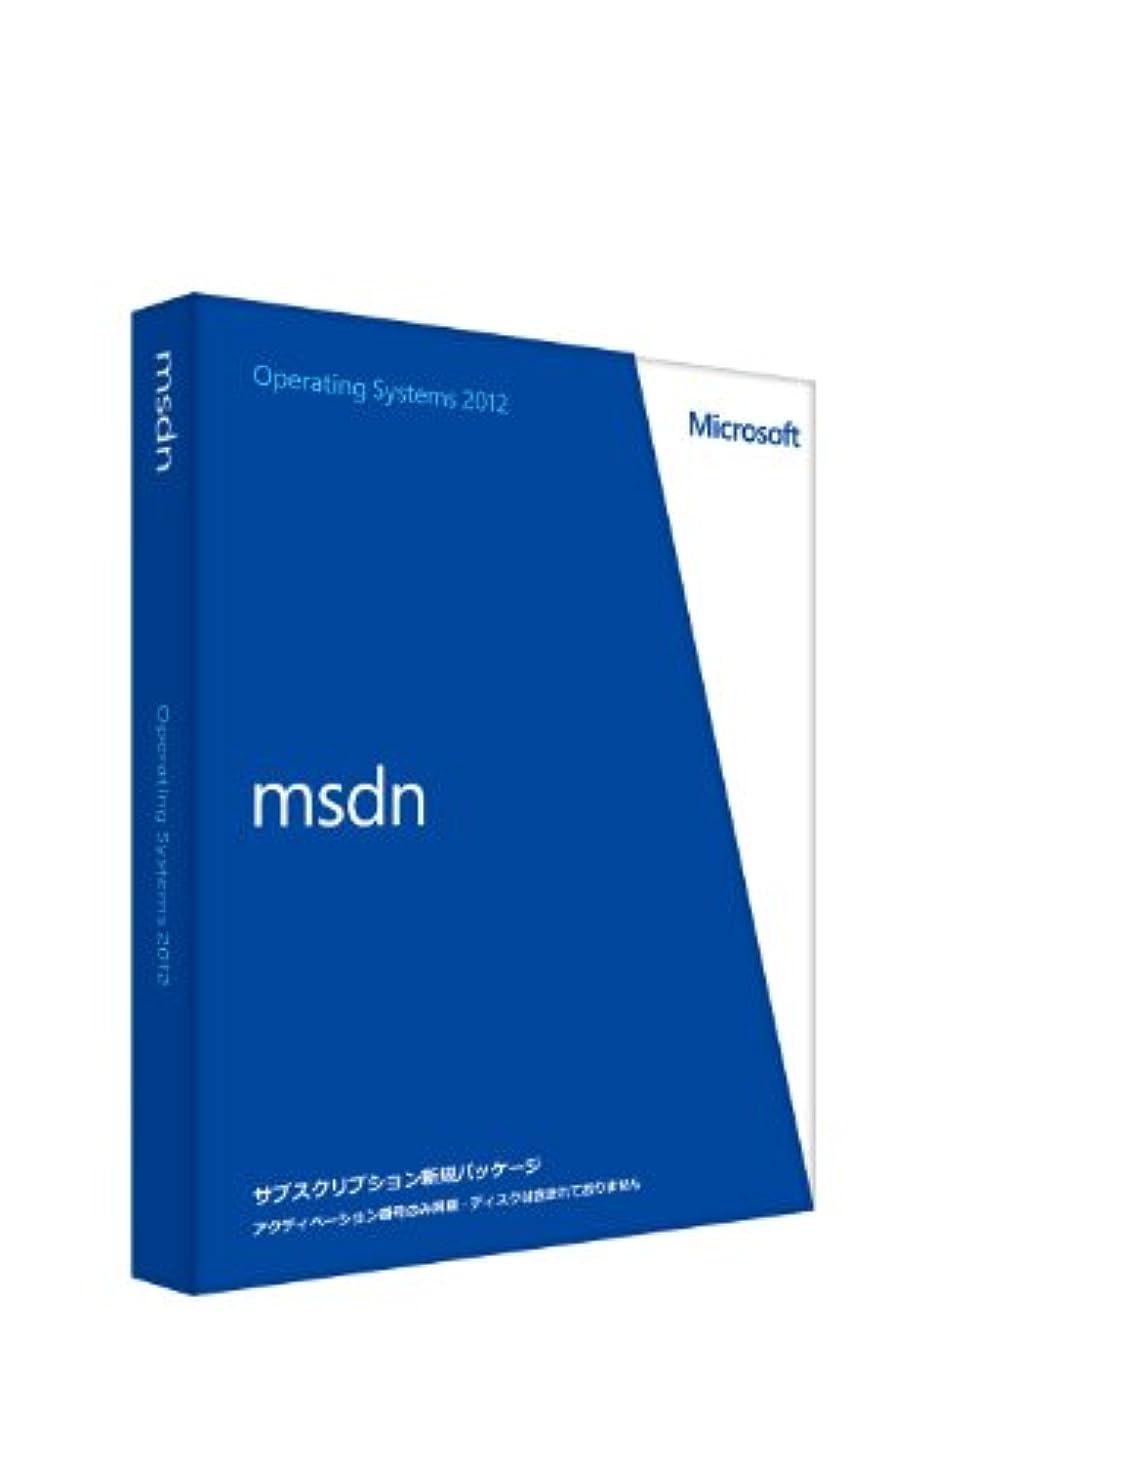 Microsoft MSDN Operating Systems 通常版